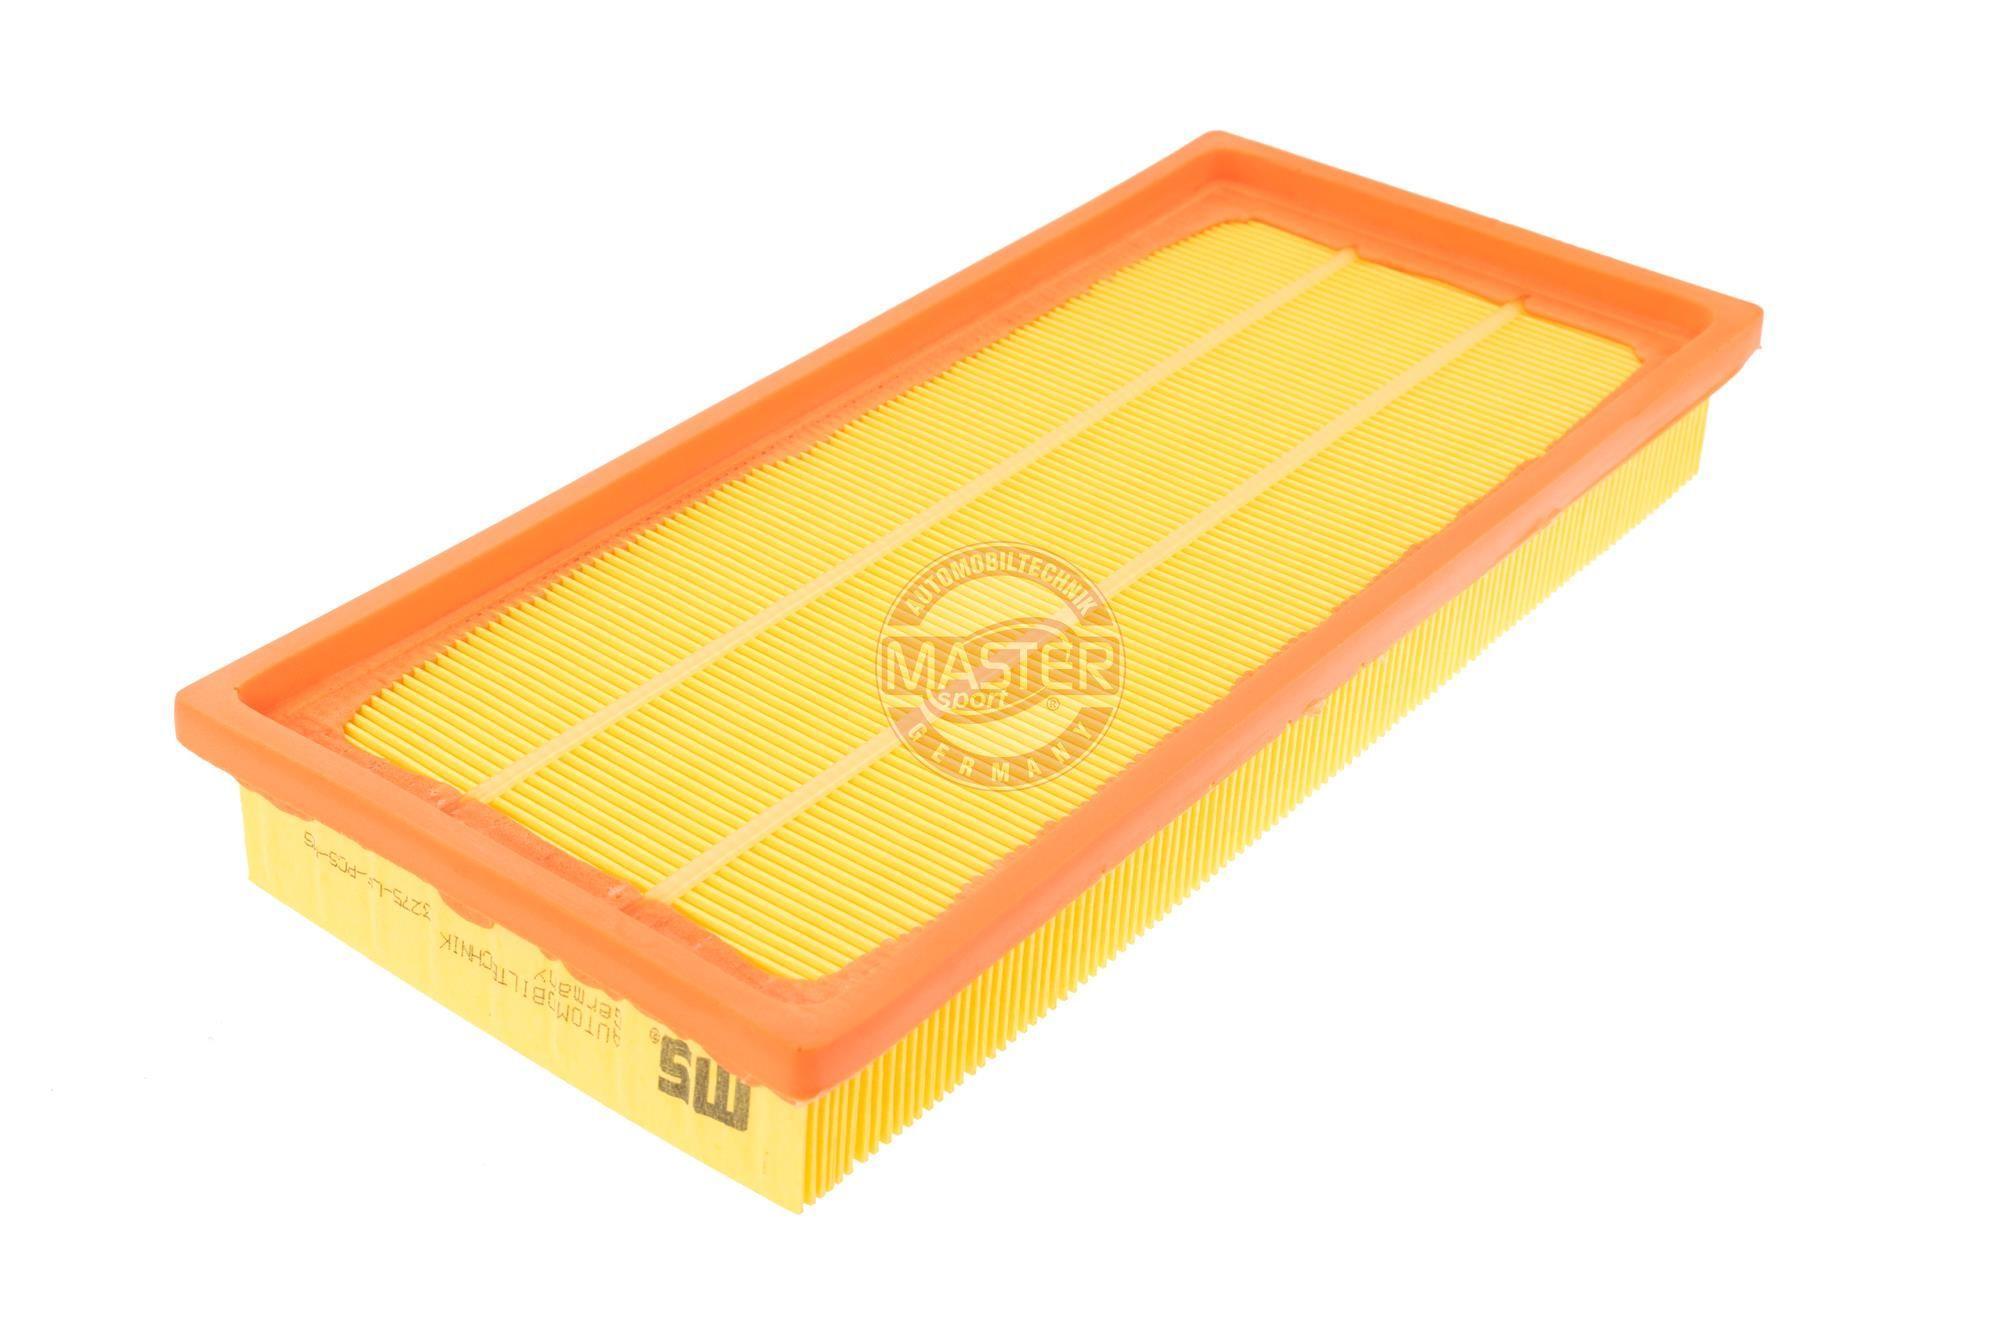 Luftfilter 3275-LF-PCS-MS MASTER-SPORT 410032750 in Original Qualität